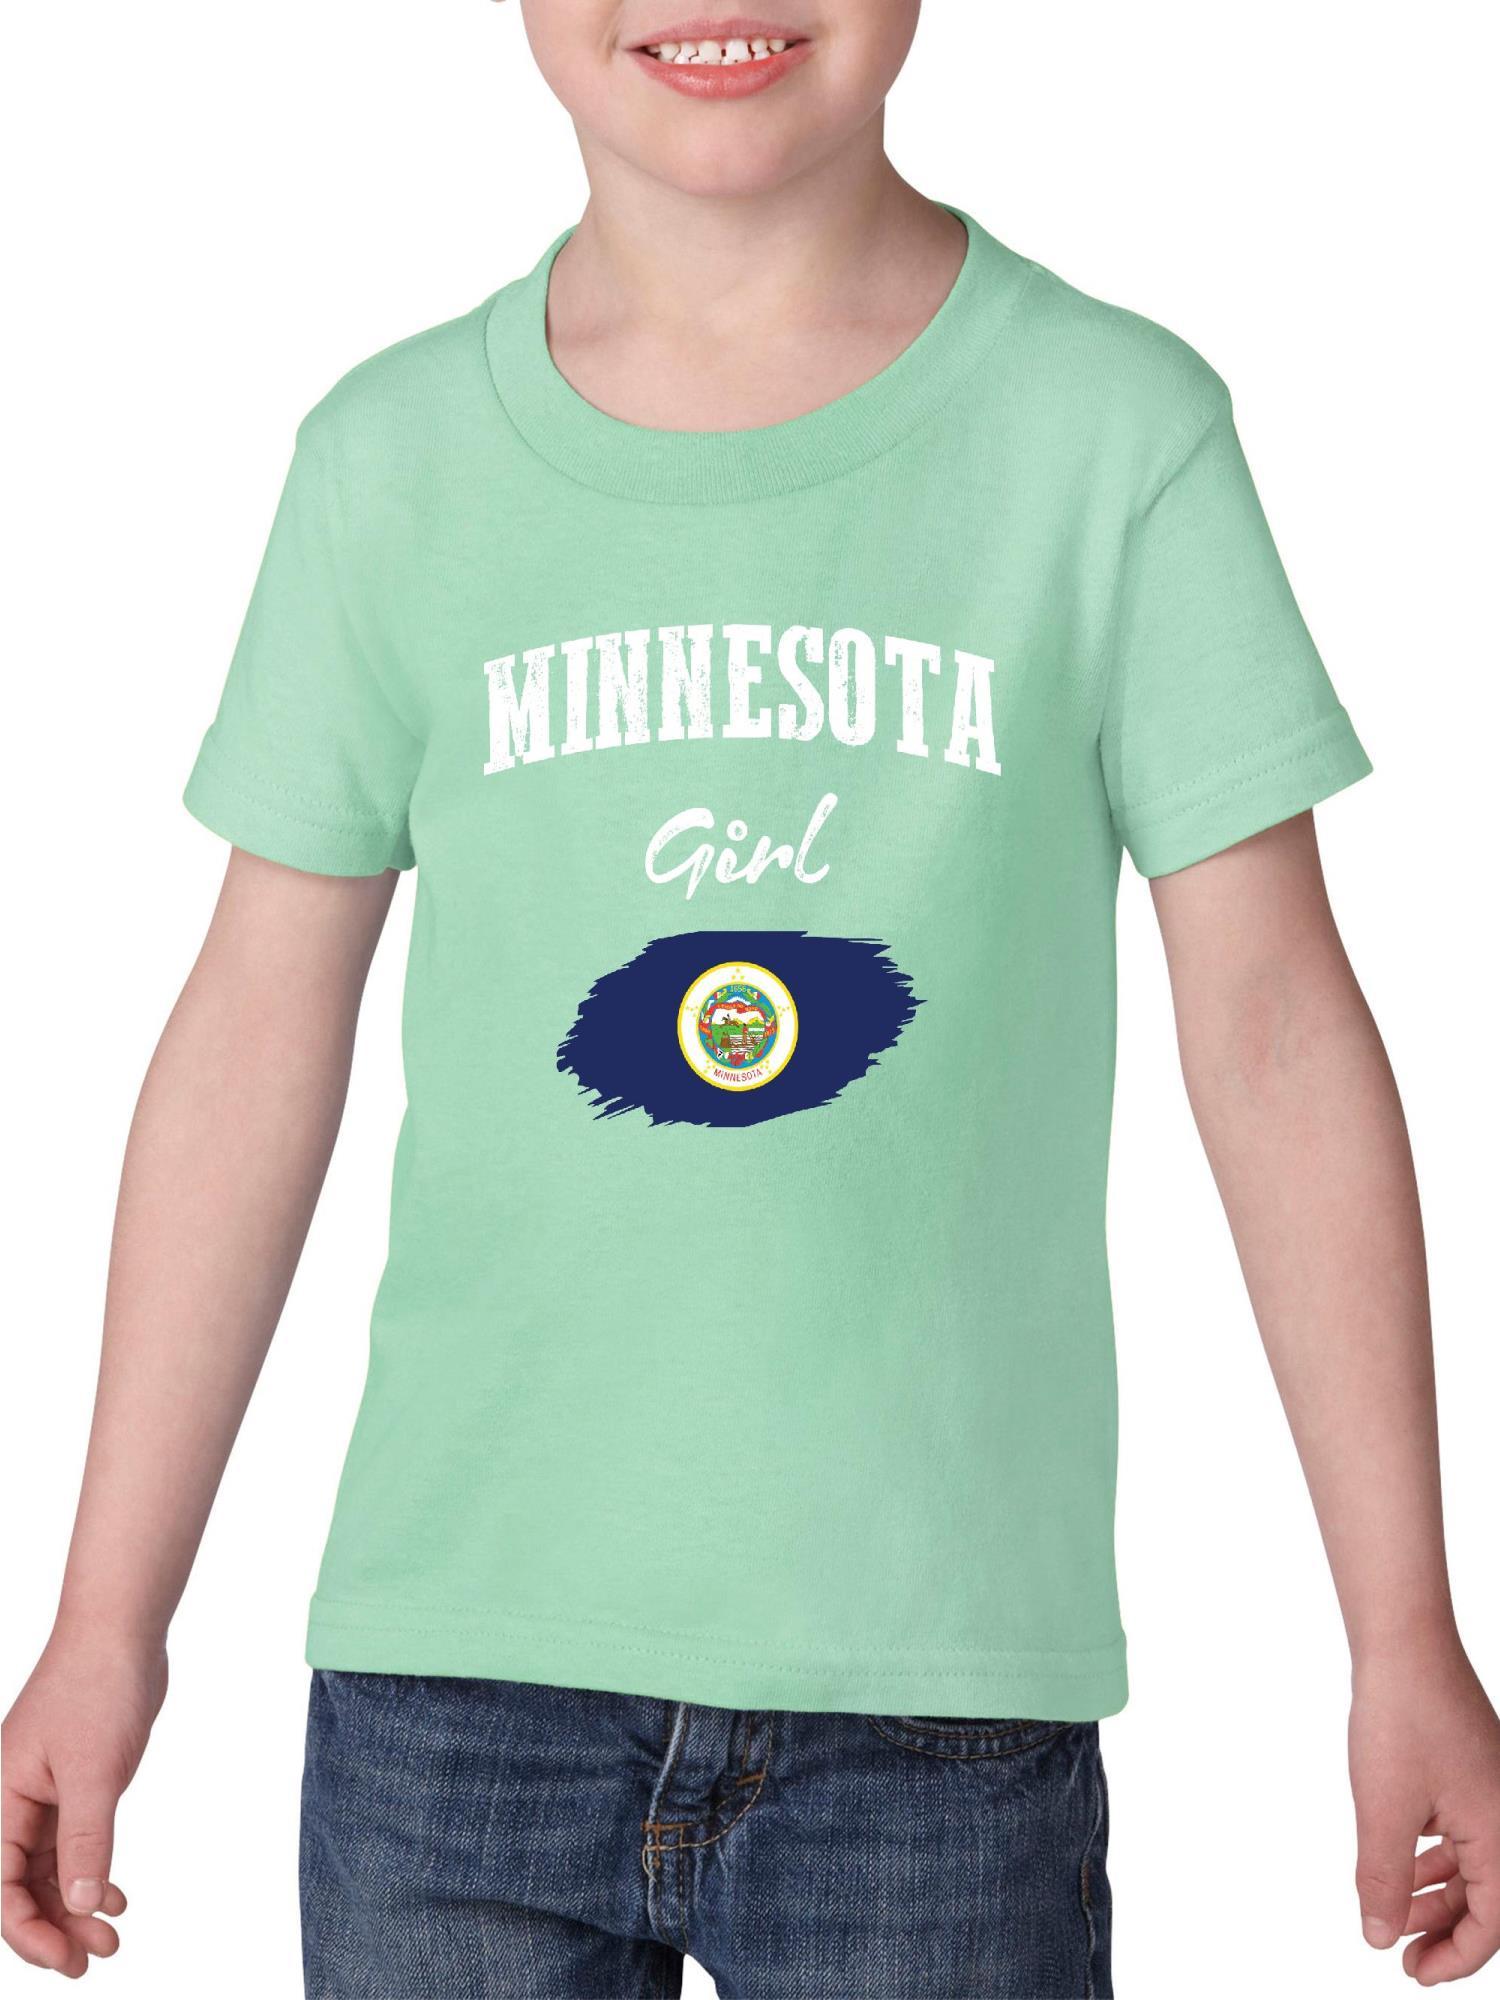 Minnesota Girl Heavy Cotton Toddler Kids T-Shirt Tee Clothing